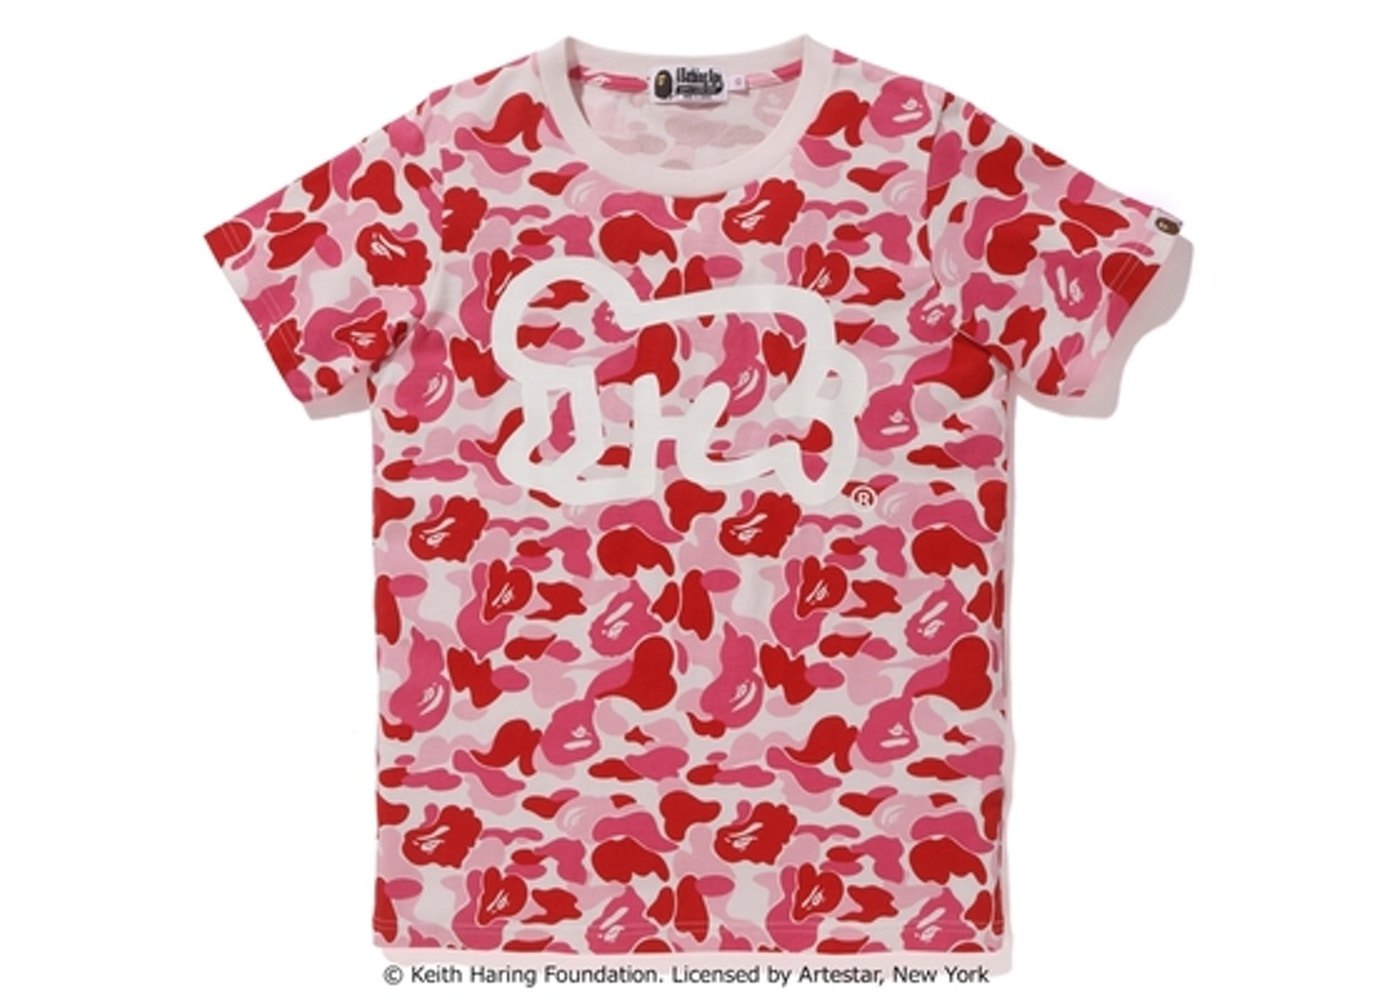 BAPE Keith Haring ABC Tee (Ladies) Pink Camo - 7887aabbc